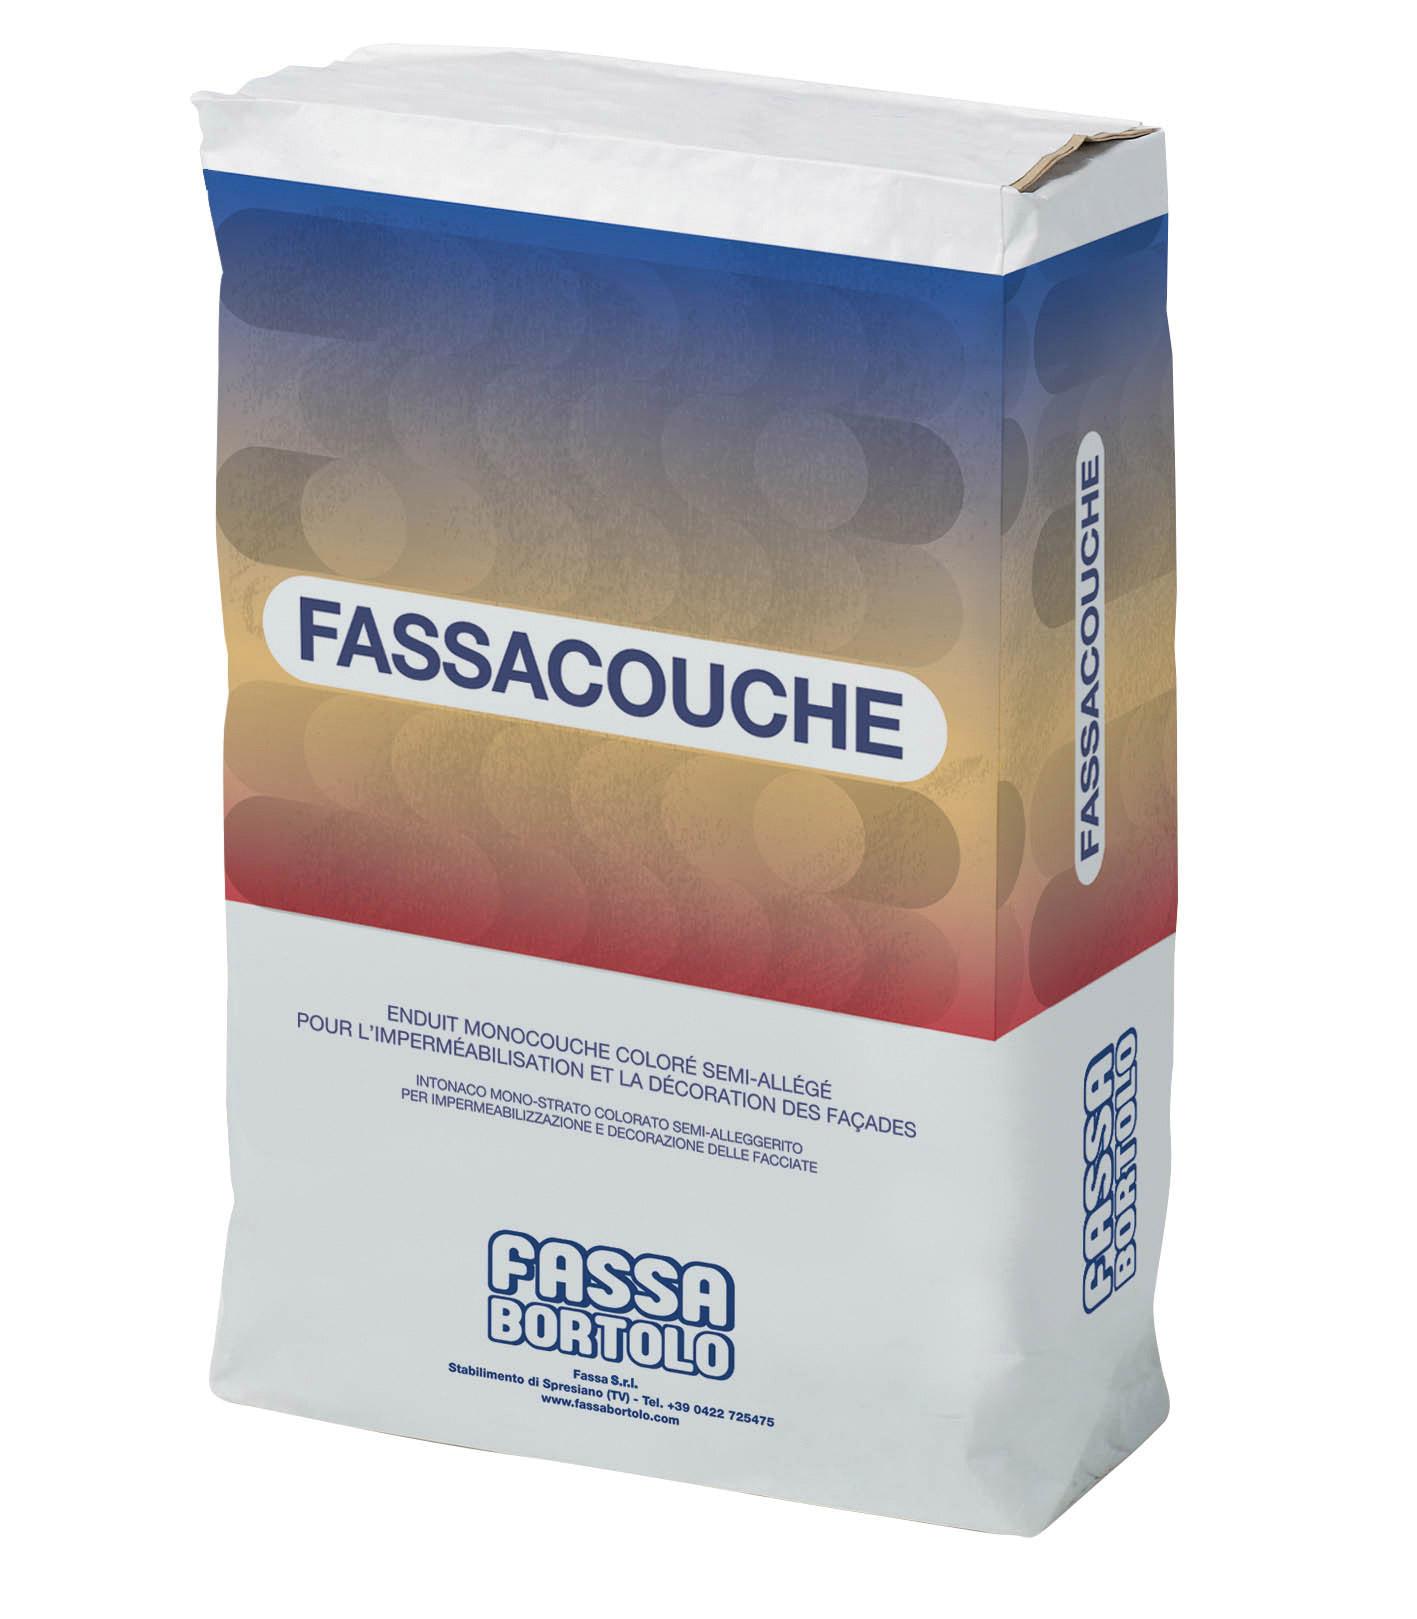 FASSACOUCHE